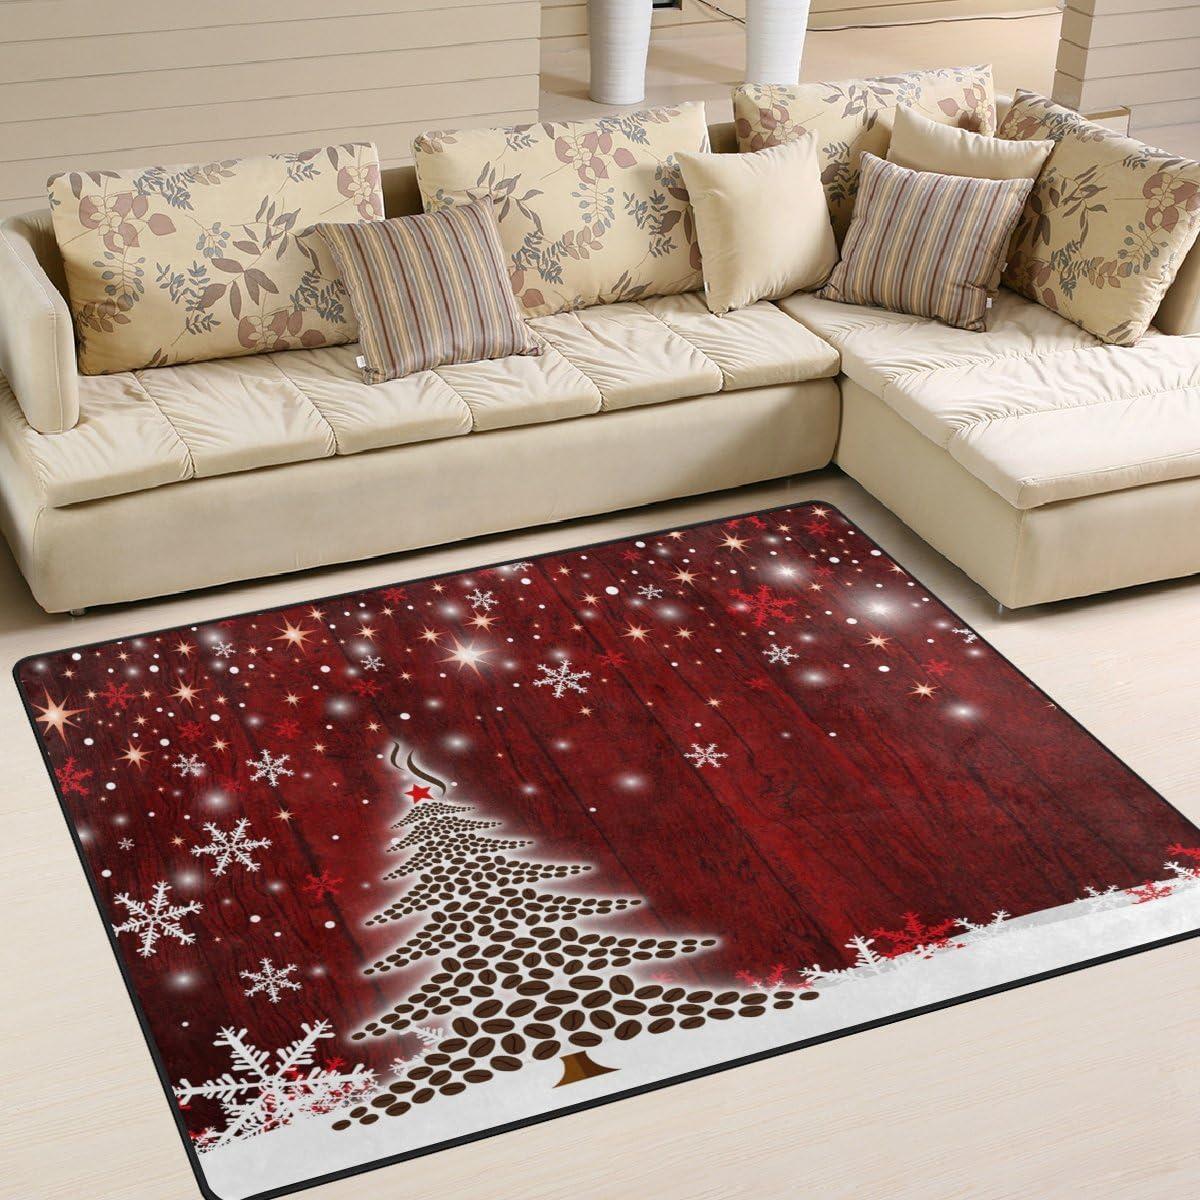 Zzkko Xmas Large Area Rug Carpet 5 X7 150x200 Cm Christmas Tree Snowflake Area Floor Rug Mat For Bedroom Living Dorm Room Kitchen Amazon Co Uk Kitchen Home